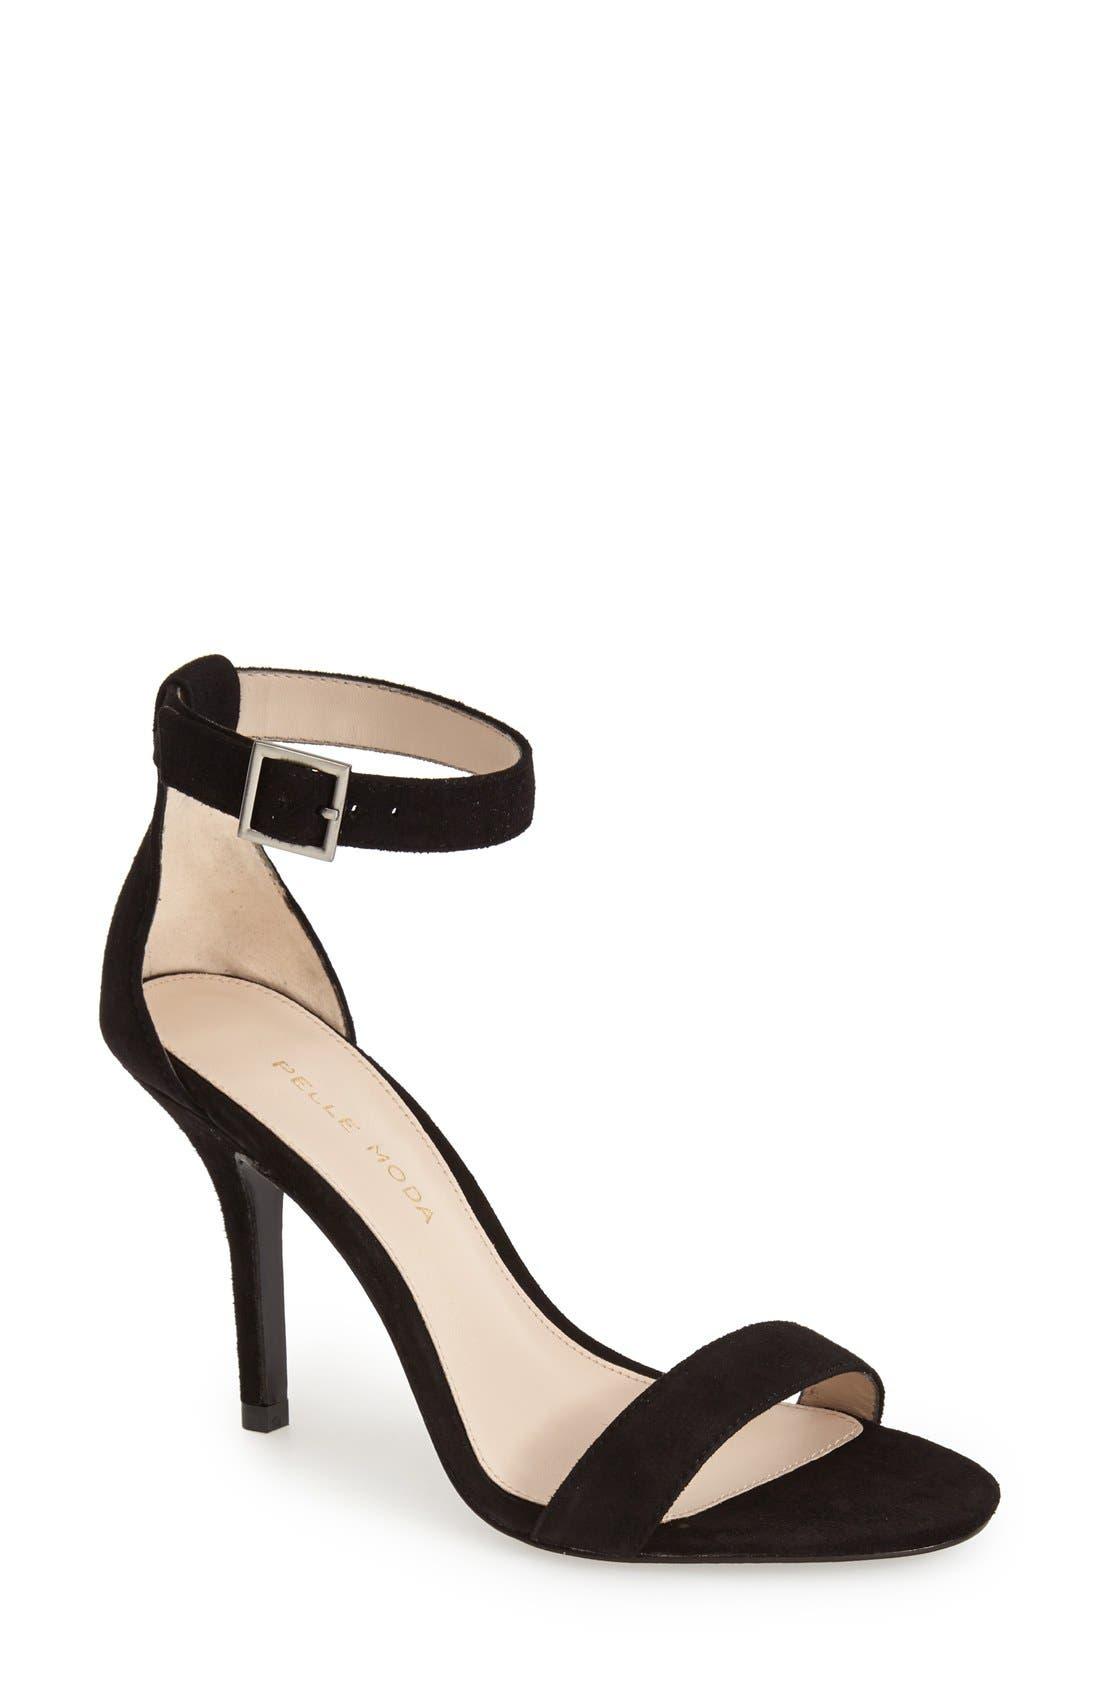 Main Image - Pelle Moda 'Kacey' Ankle Strap Sandal